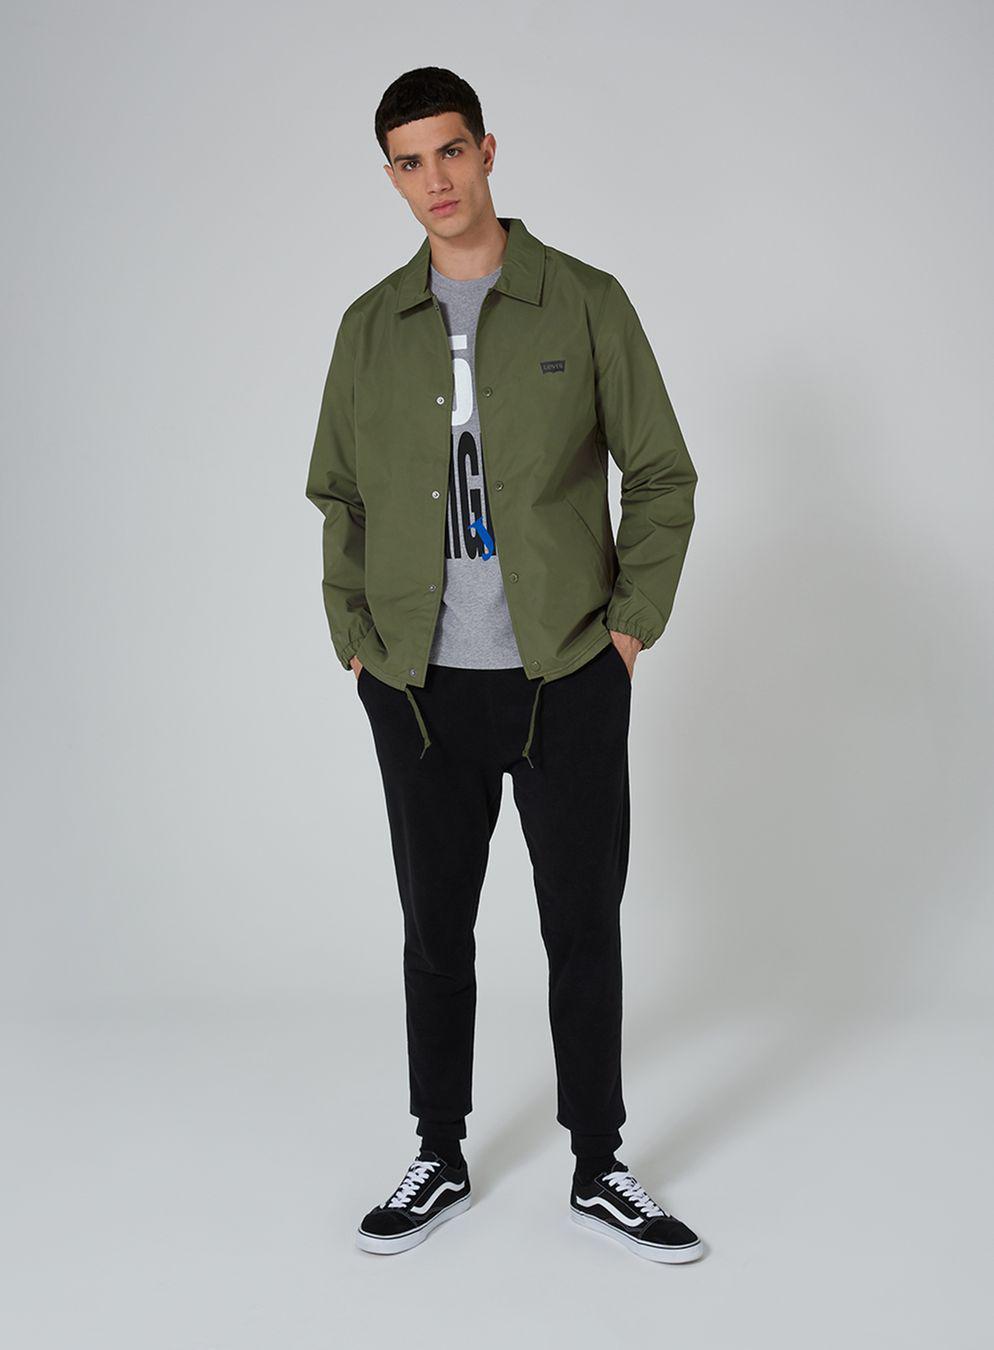 d4a72f466 Men Green Jacket Coach Khaki In For Levi's Lyst Topman tqx0vXwRt